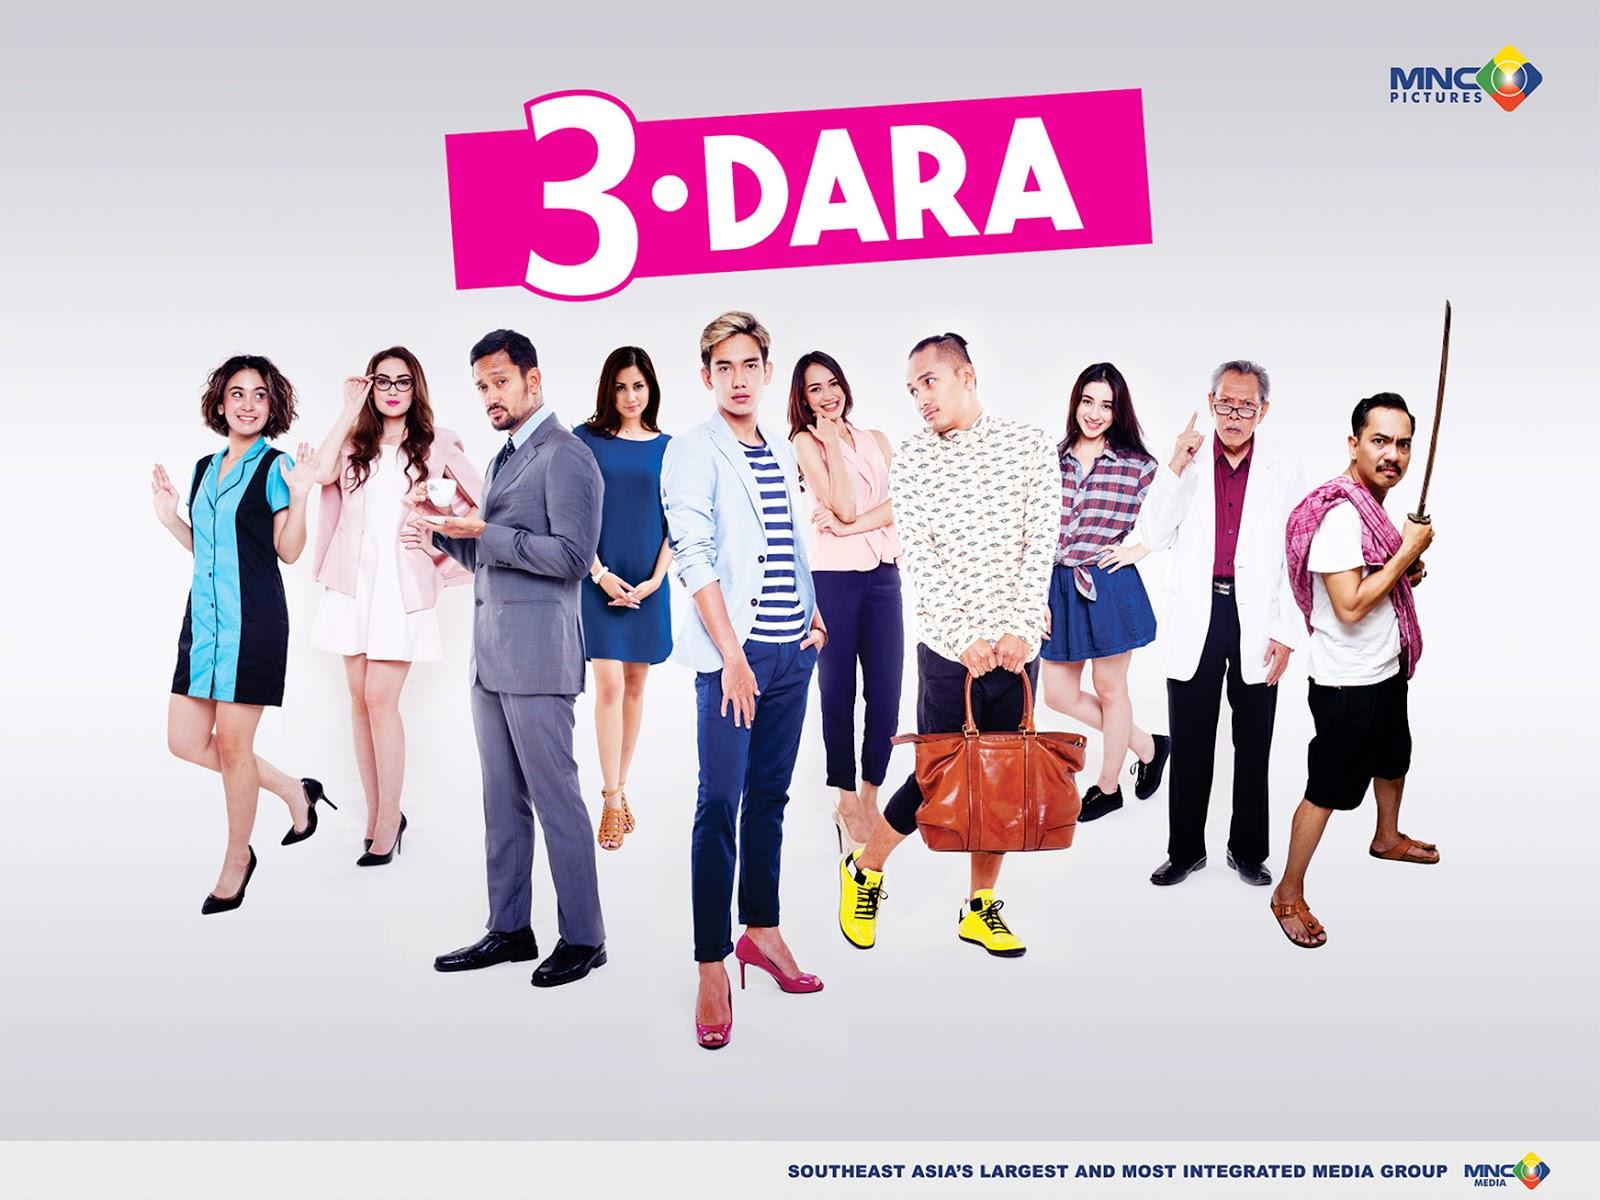 Jan Dara Lk21 - Layar Kaca 21